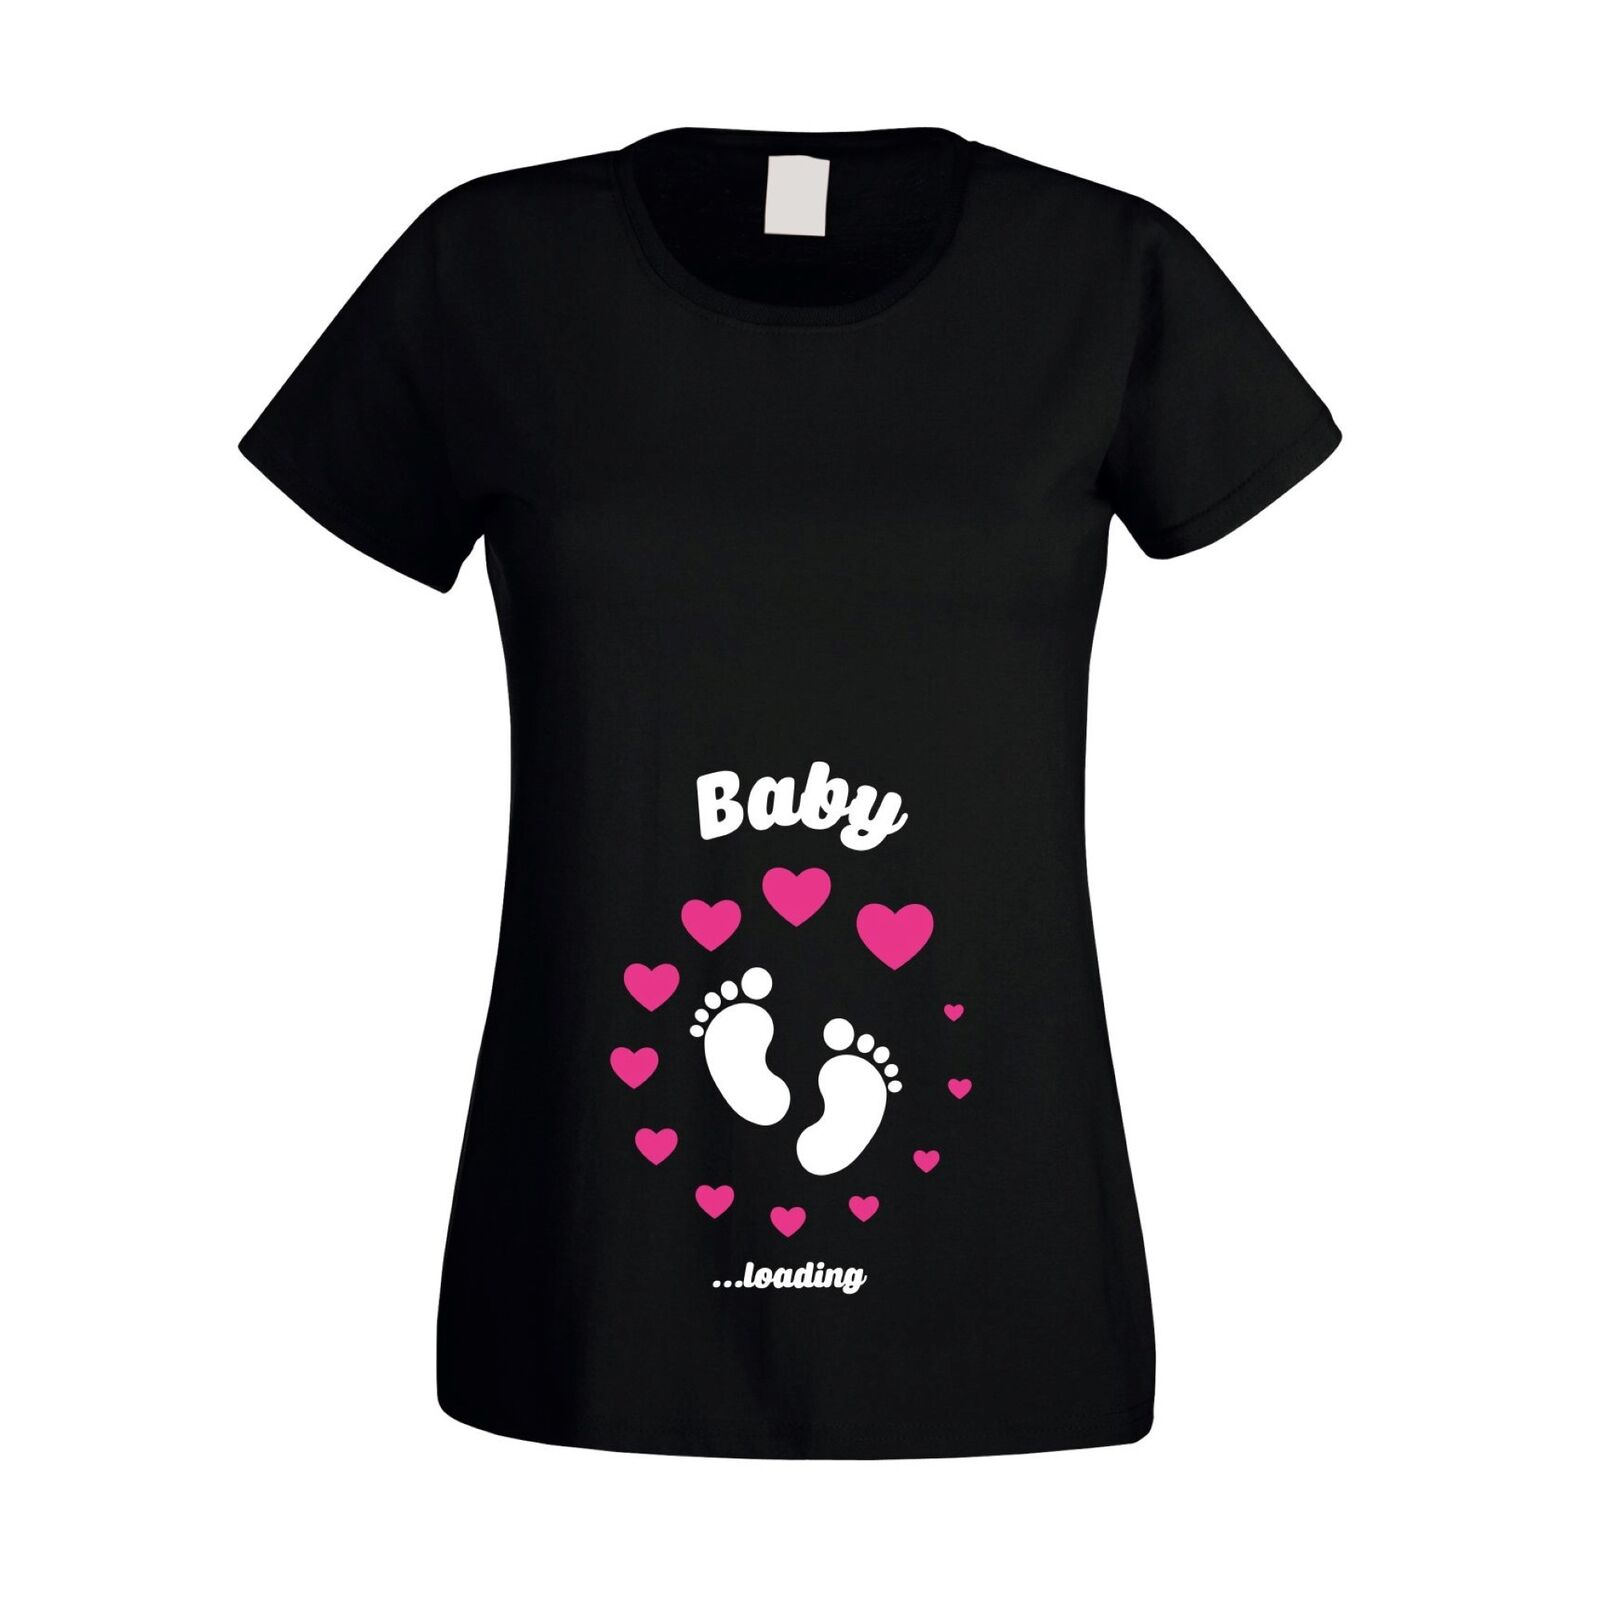 Baby loading - Damen T-Shirt - Geburt Kind Nachwuchs Schwangerschaft